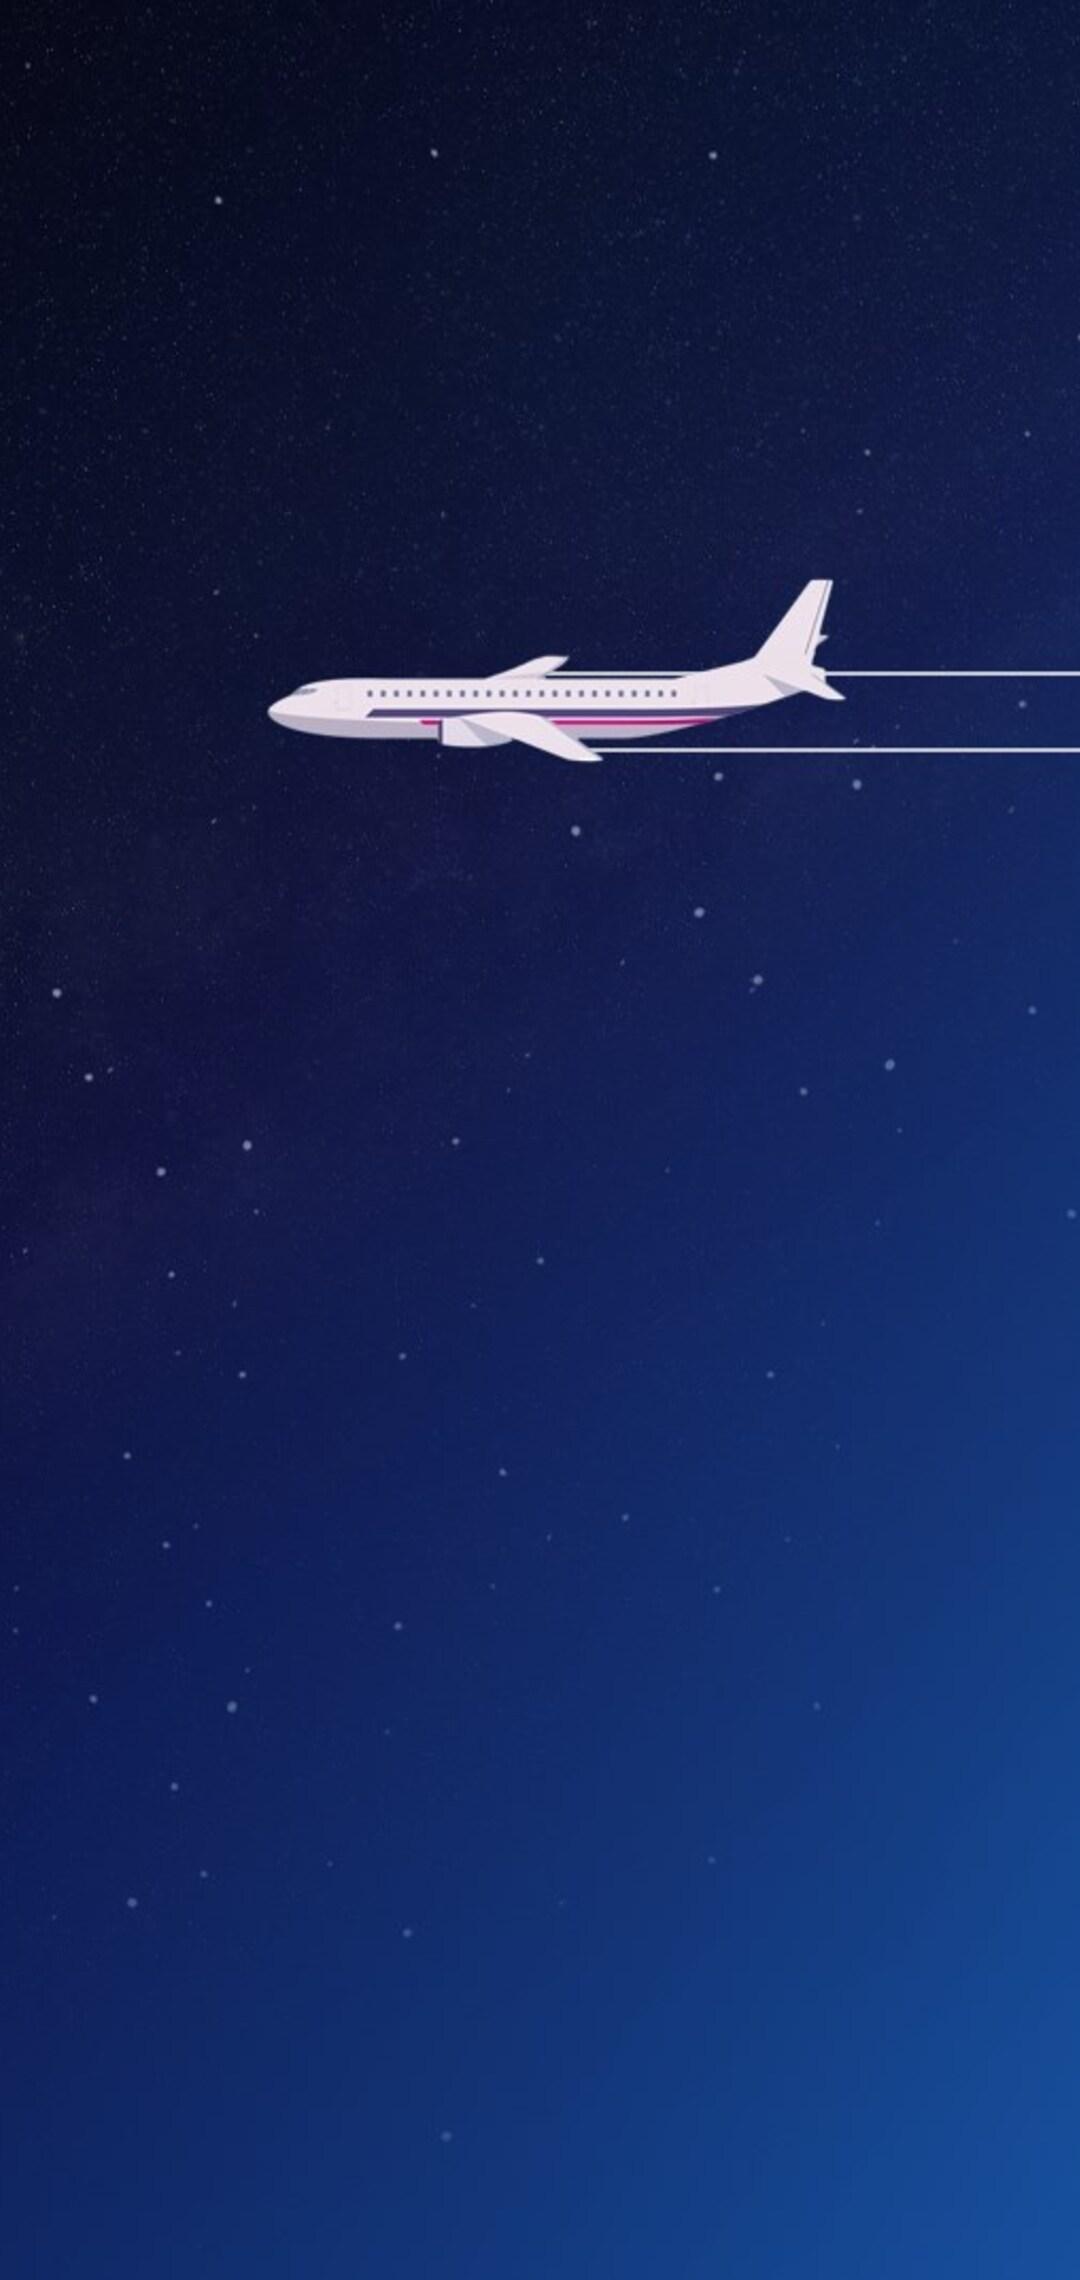 1080x2280 Airplane Digital Art One Plus 6 Huawei P20 Honor View 10